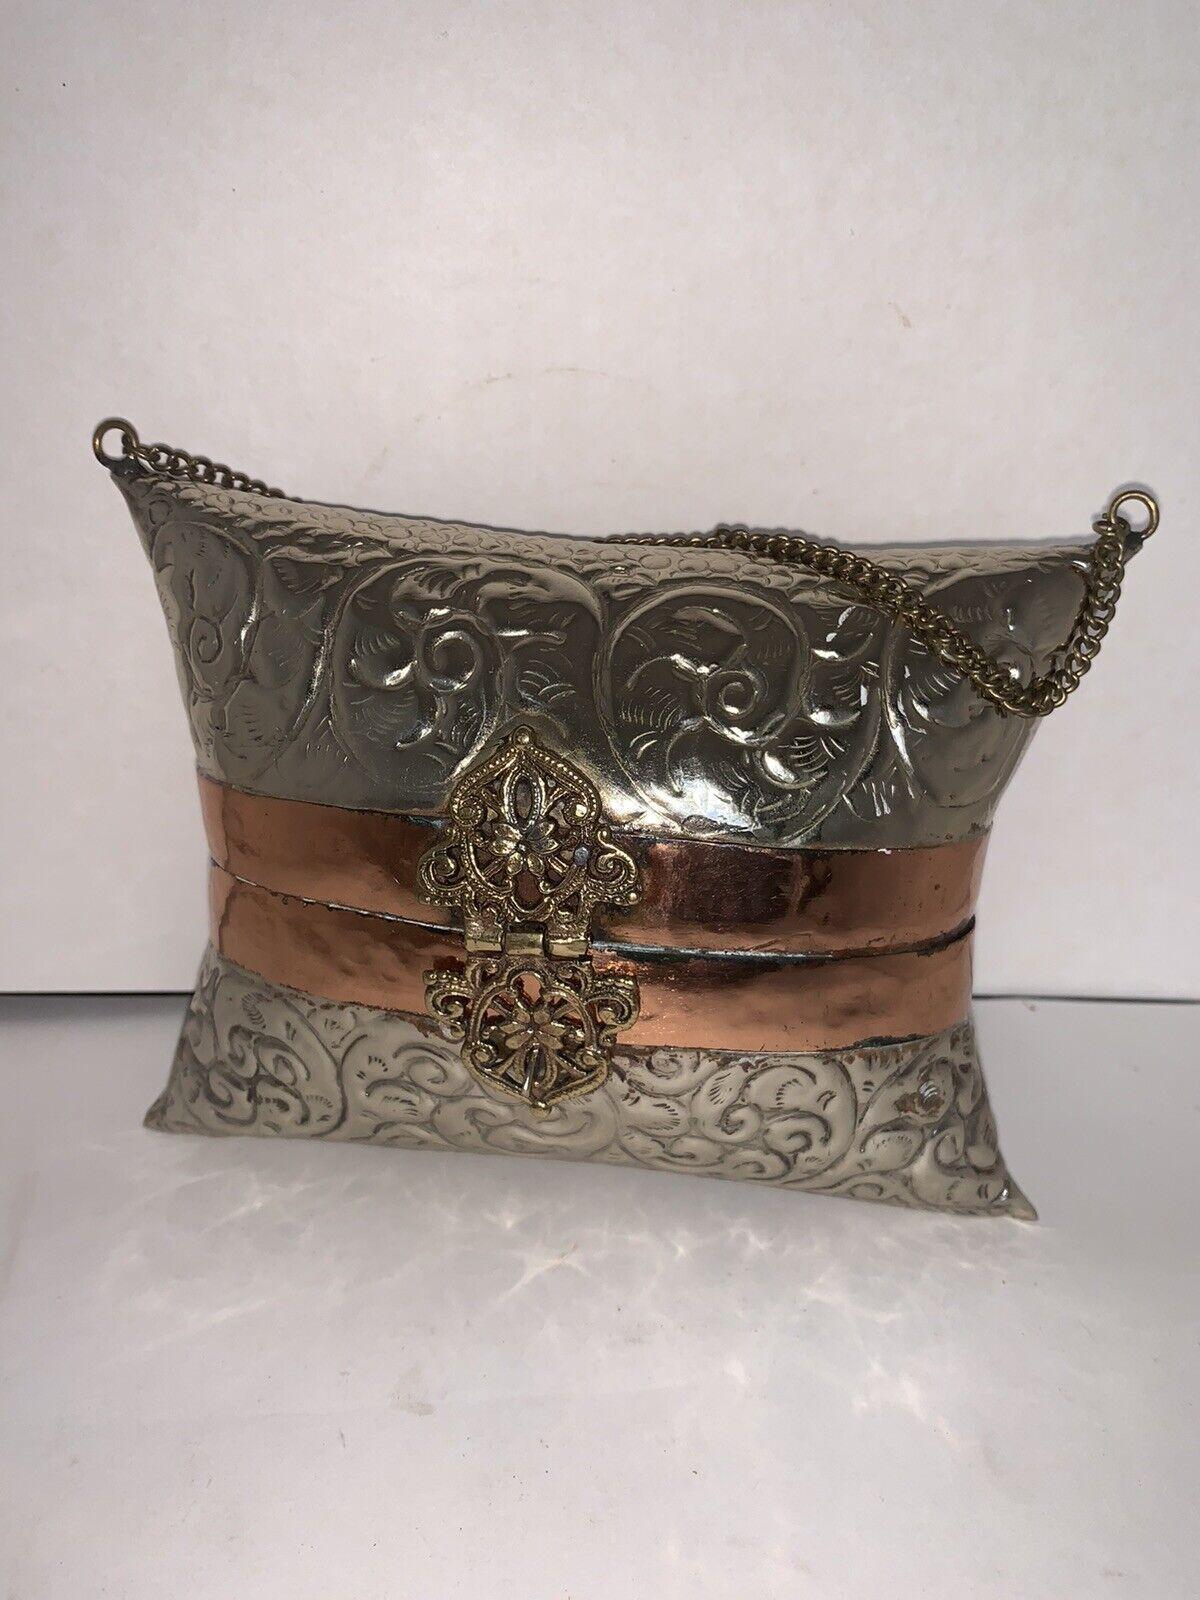 Vintage Pillow Purse Evening Bag Brass & Copper 1930s Blue Velvet Lining Cushion